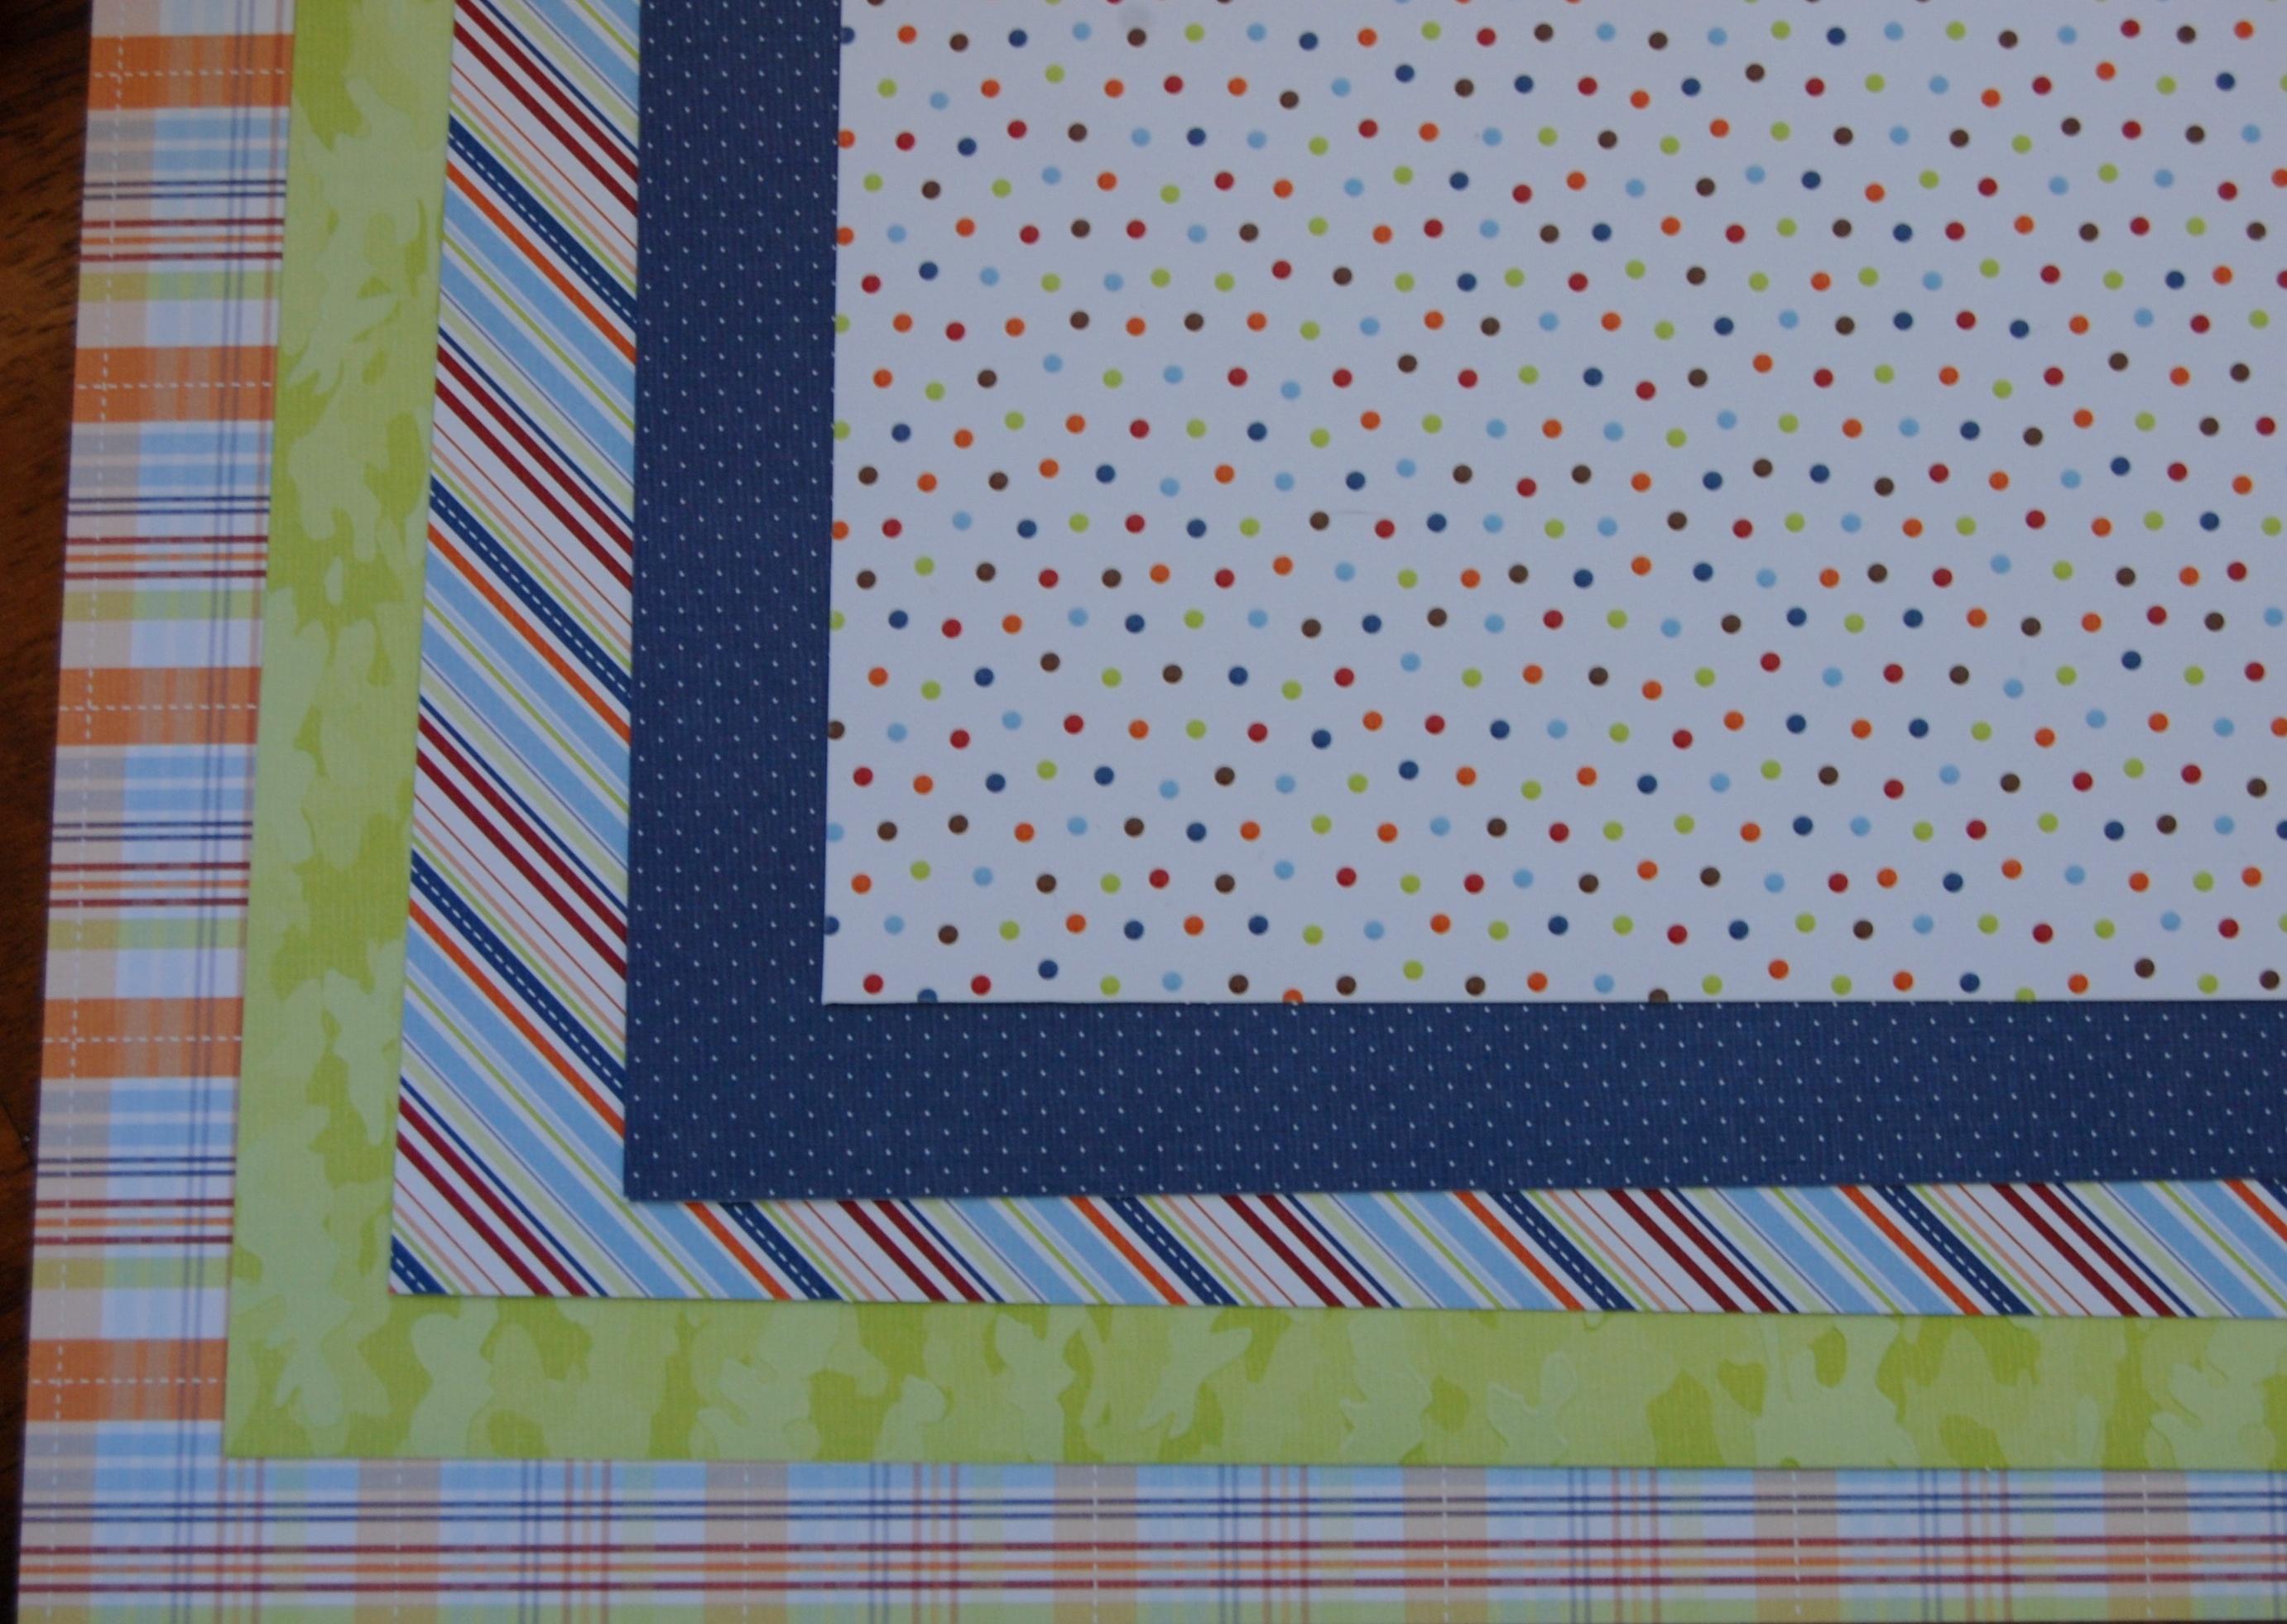 Craft Paper Roll Joann Fabric